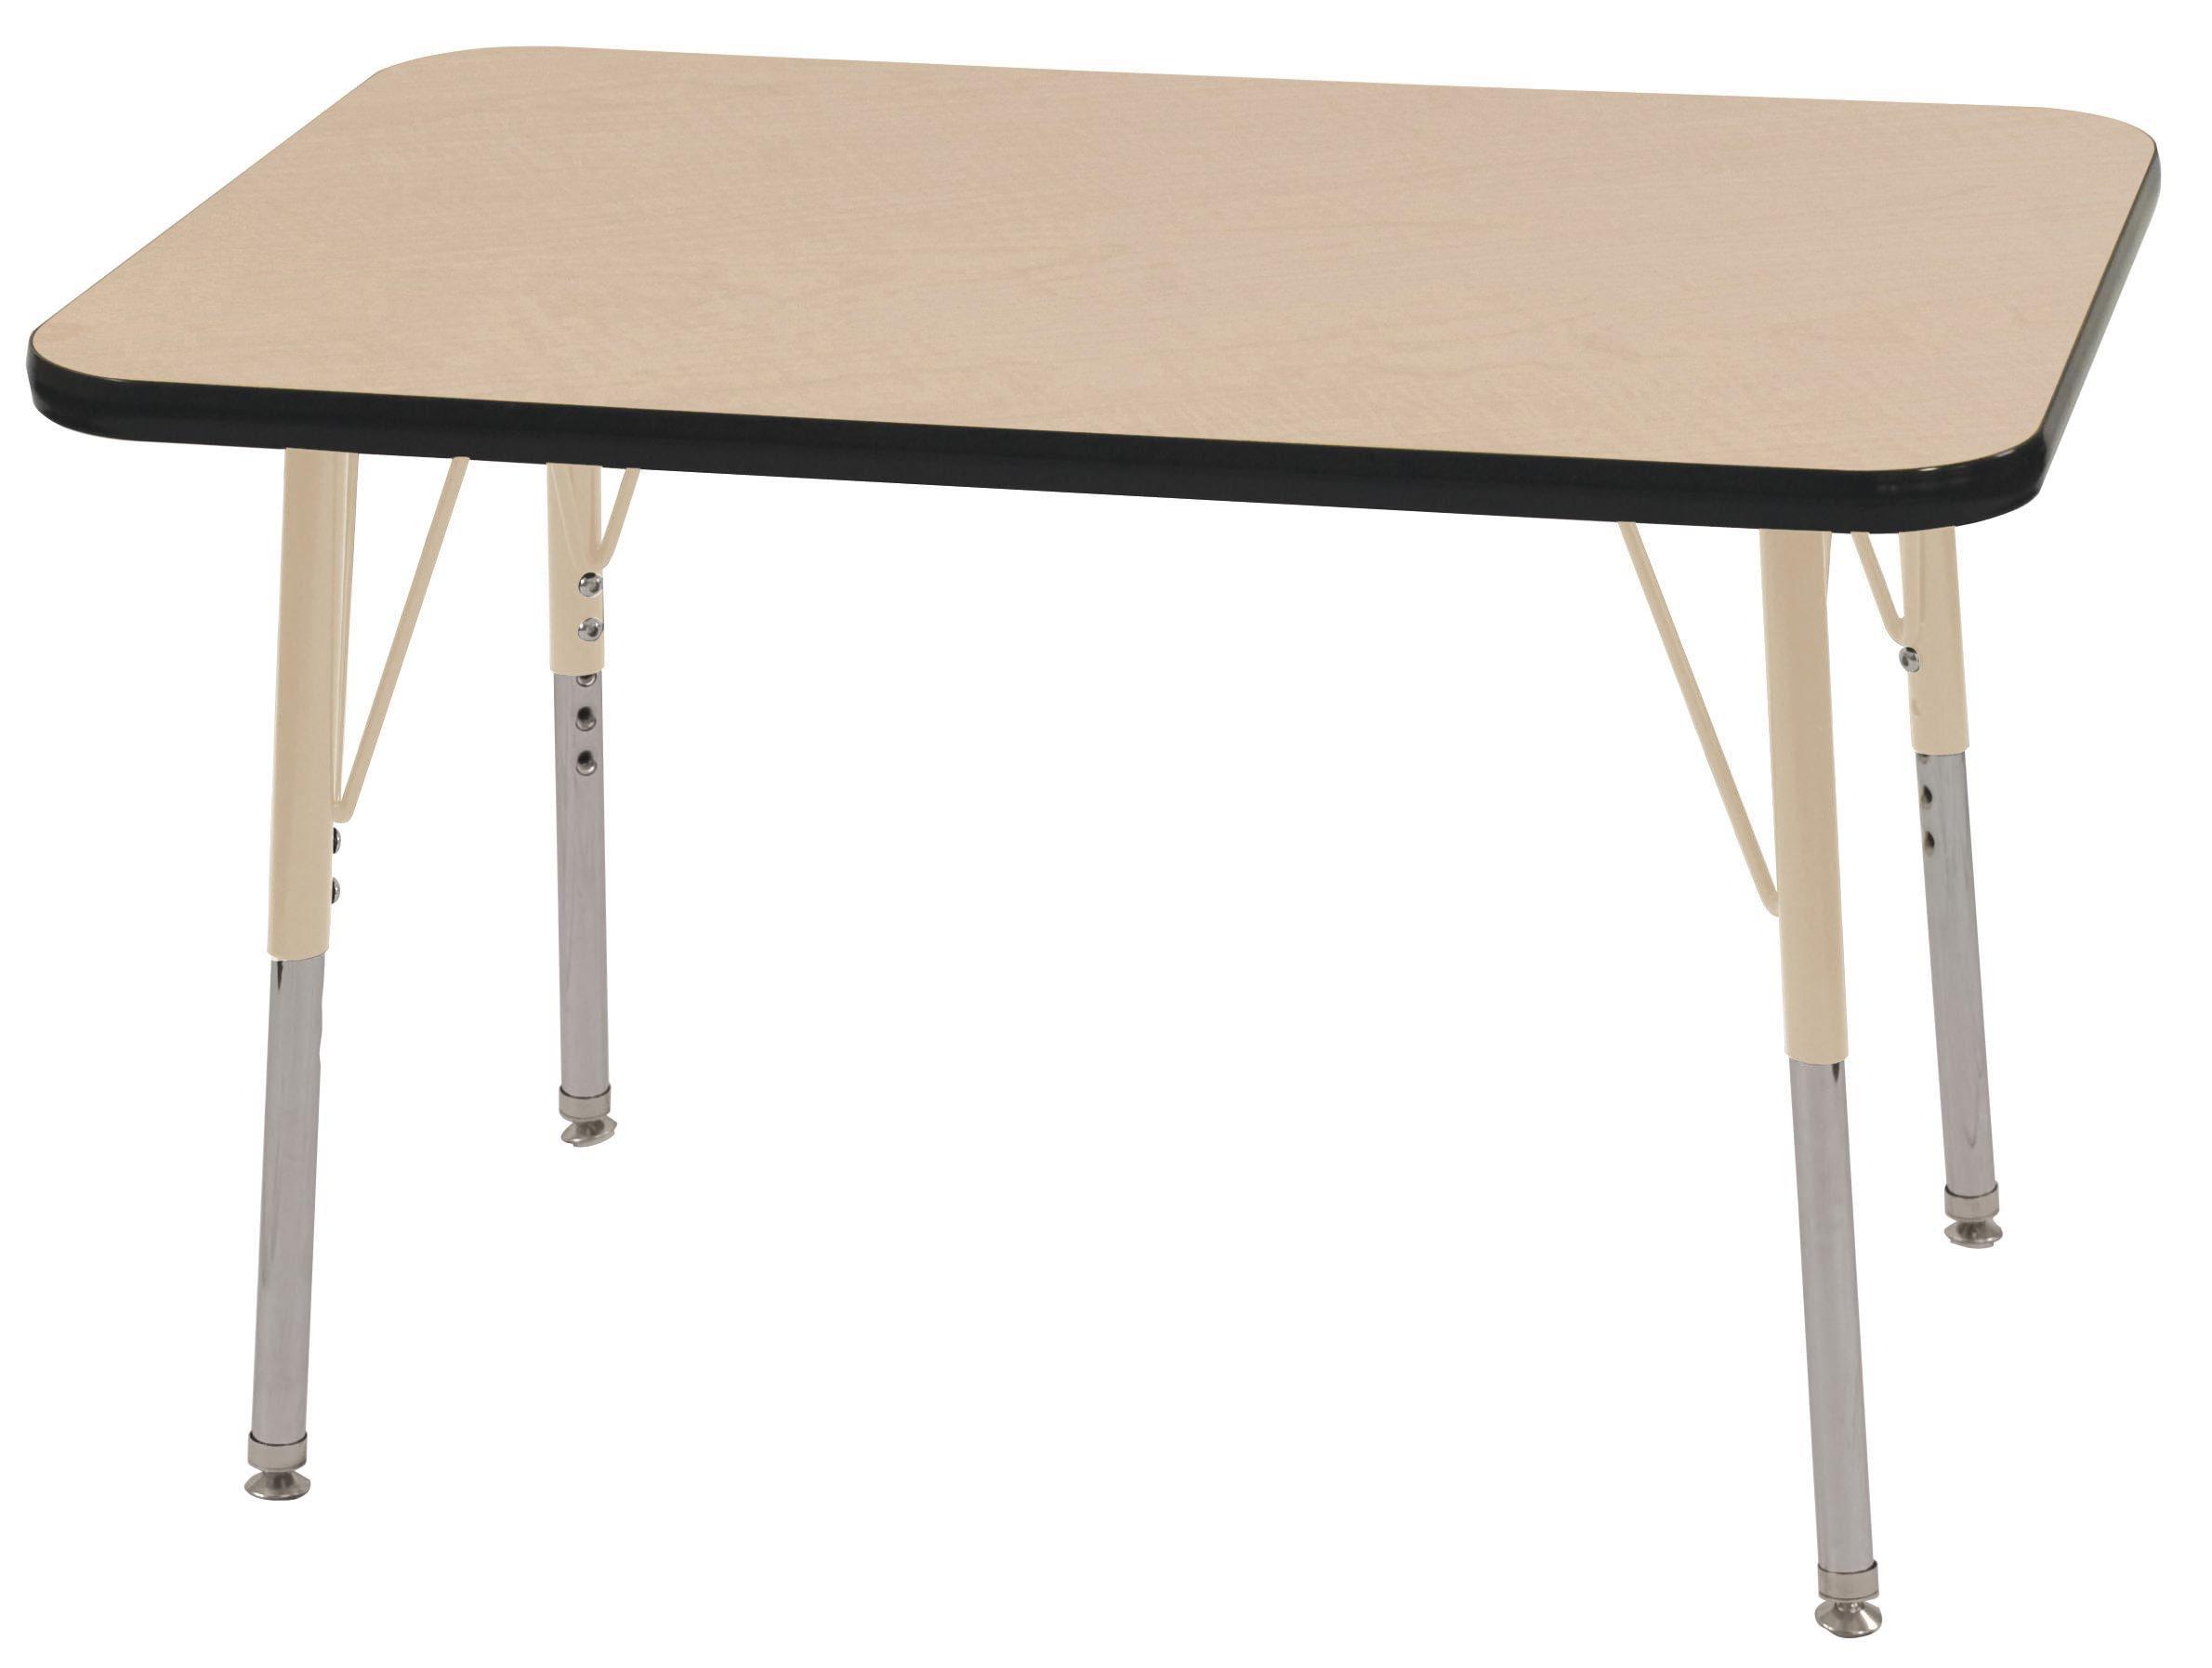 ECR4Kids T-Mold 24'' x 36'' Rectangular Activity School Table, Standard Legs w/ Swivel Glides, Adjustable Height 19-30 inch (Maple/Black/Sand)